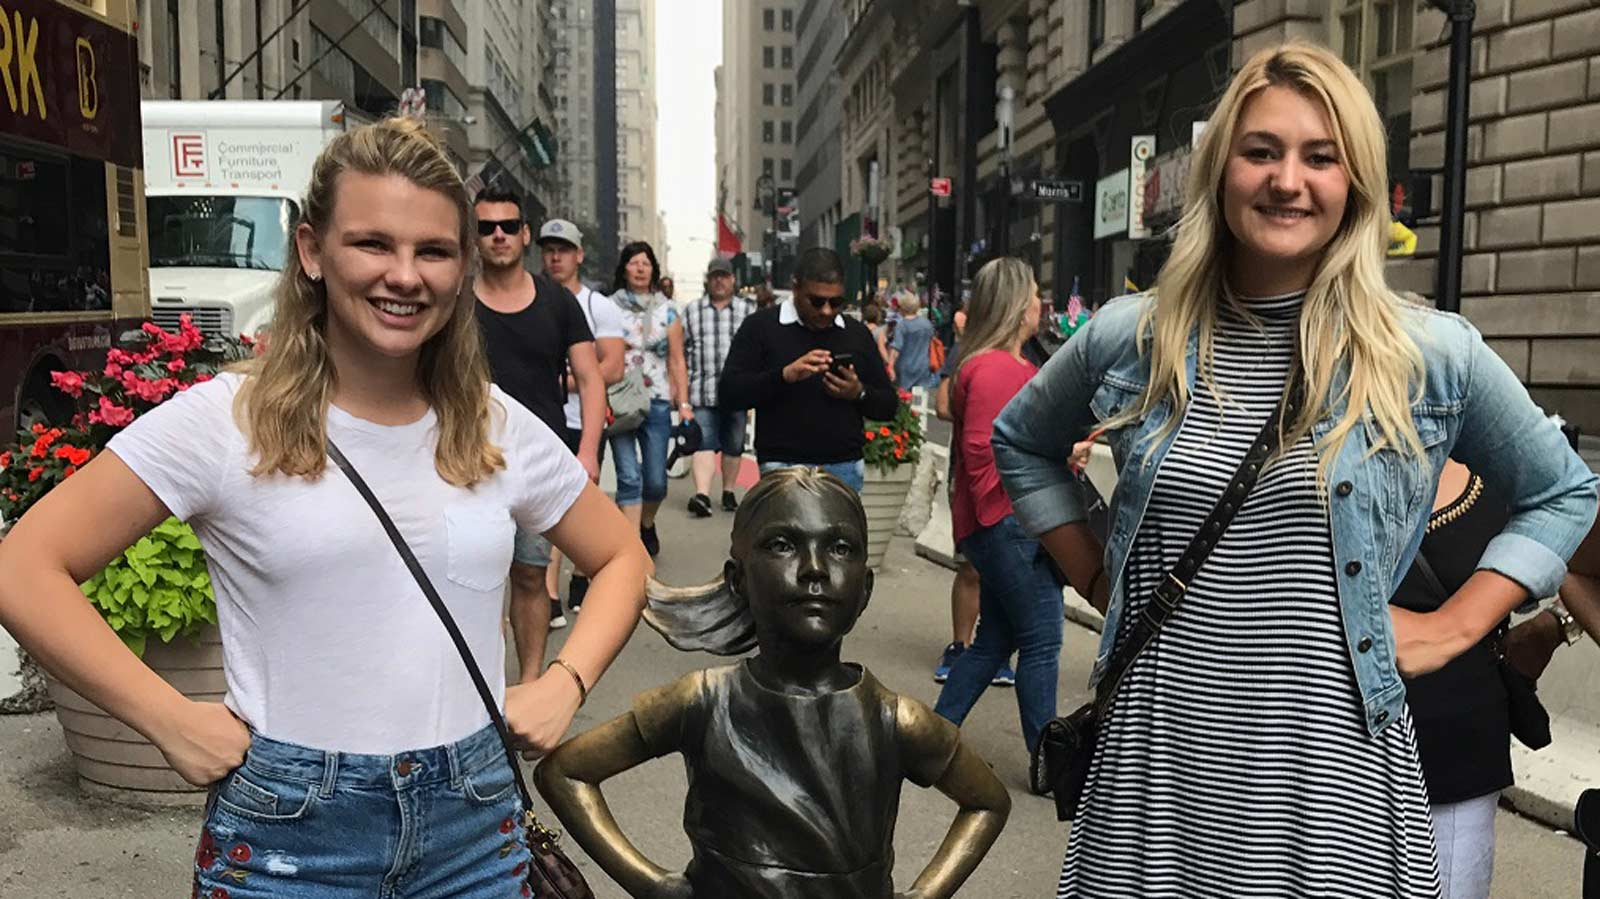 FMI scholars standing next to Fearless Girl sculpture on Wall Street.